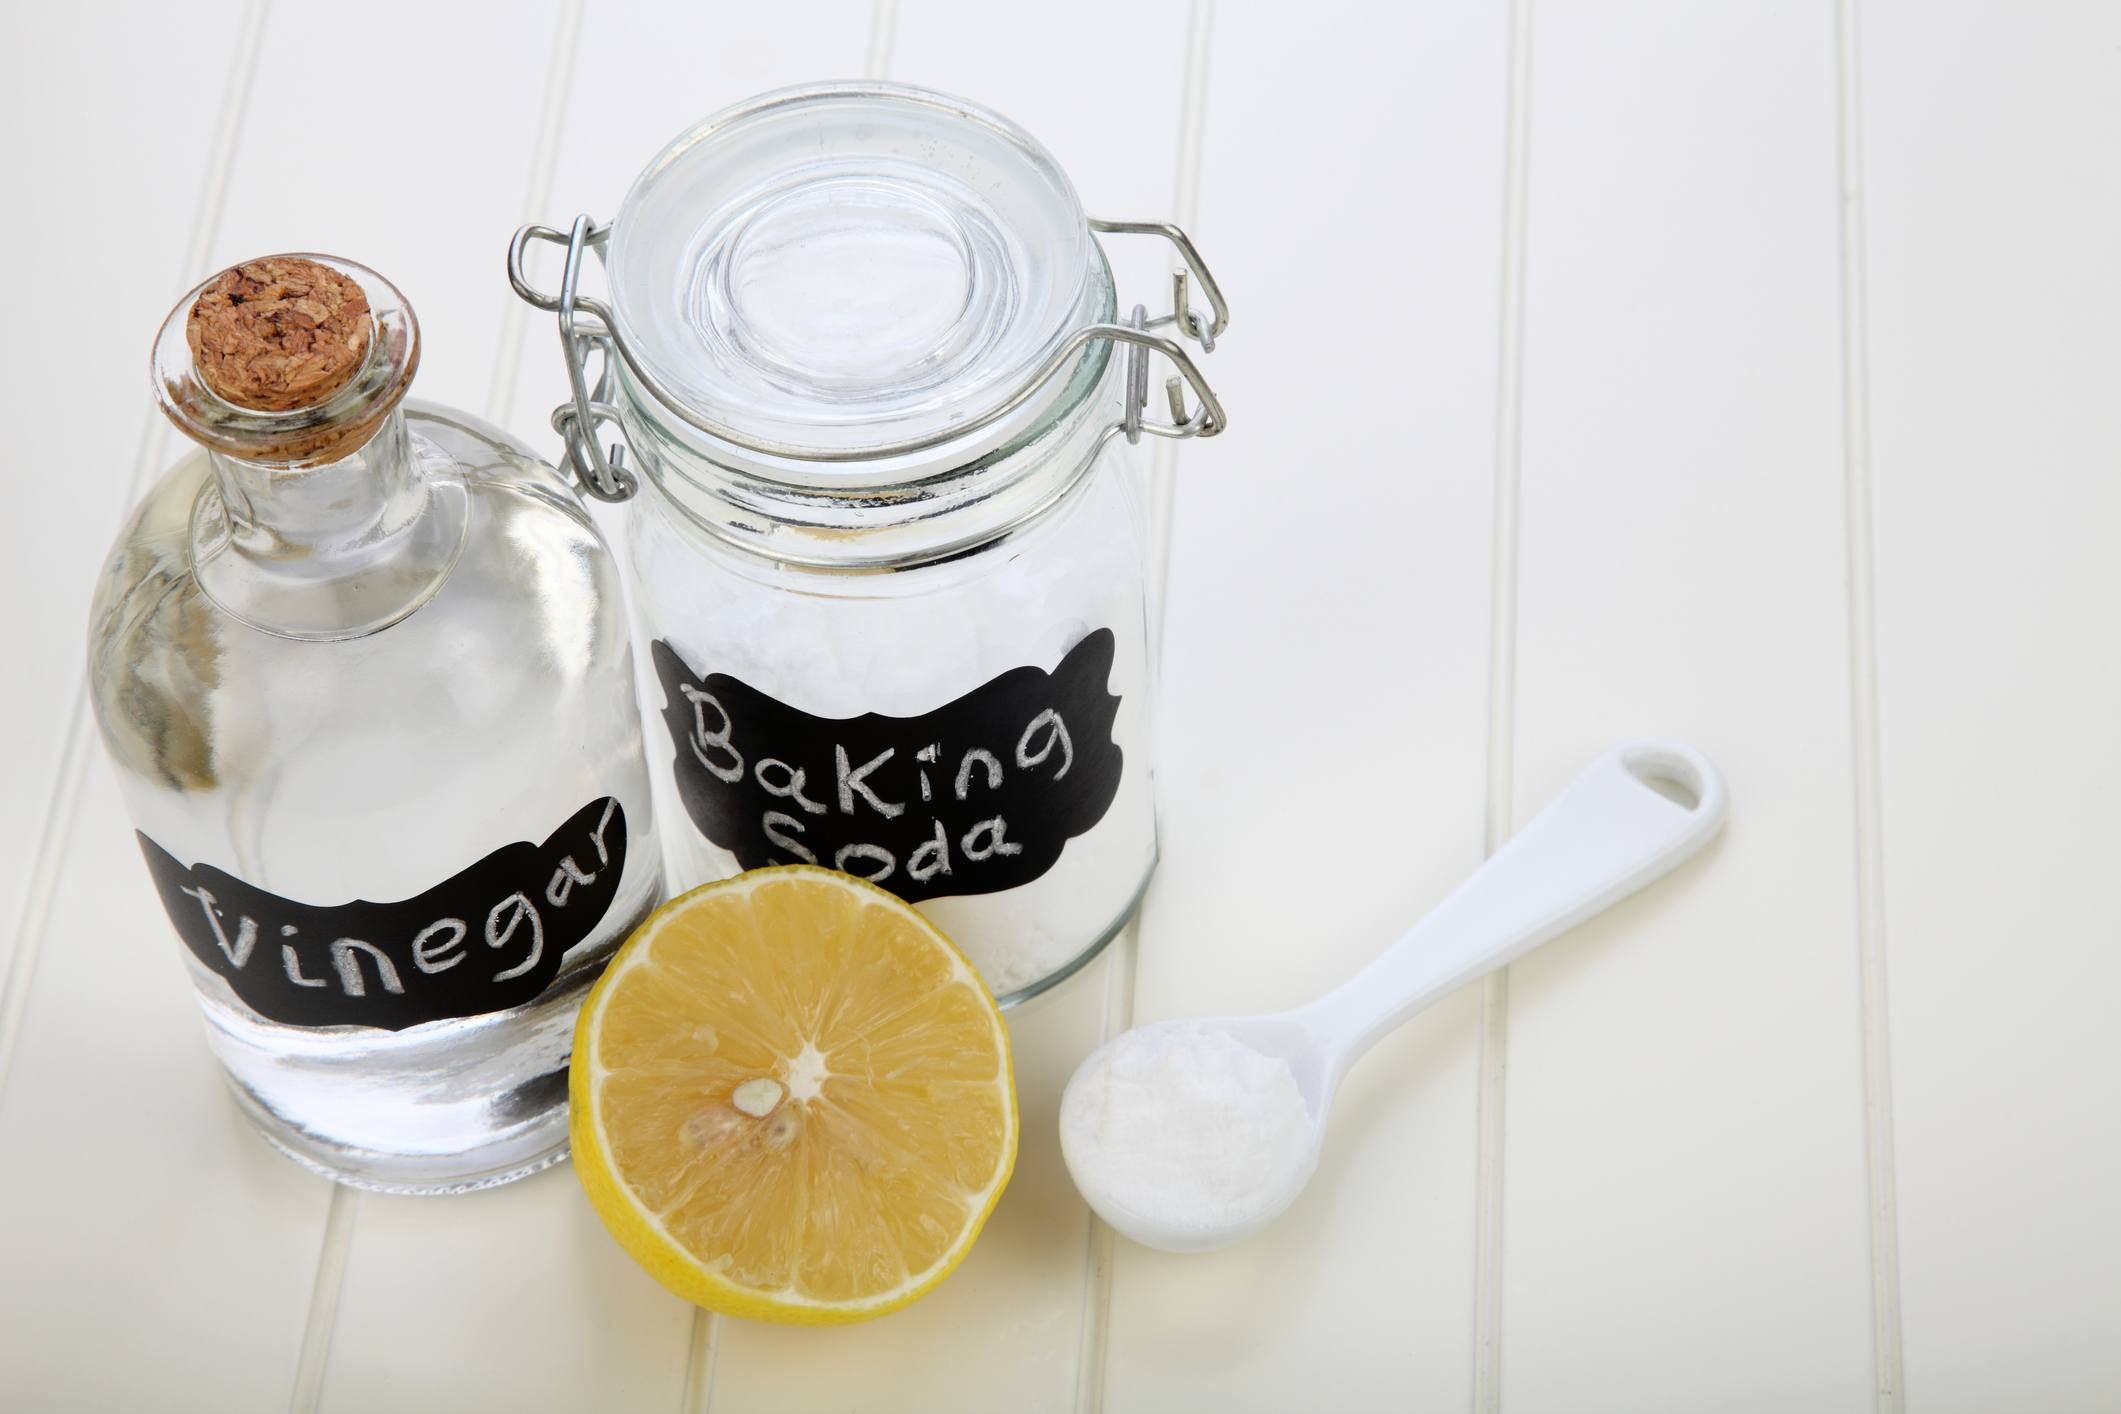 Baking soda vinegar cleaning